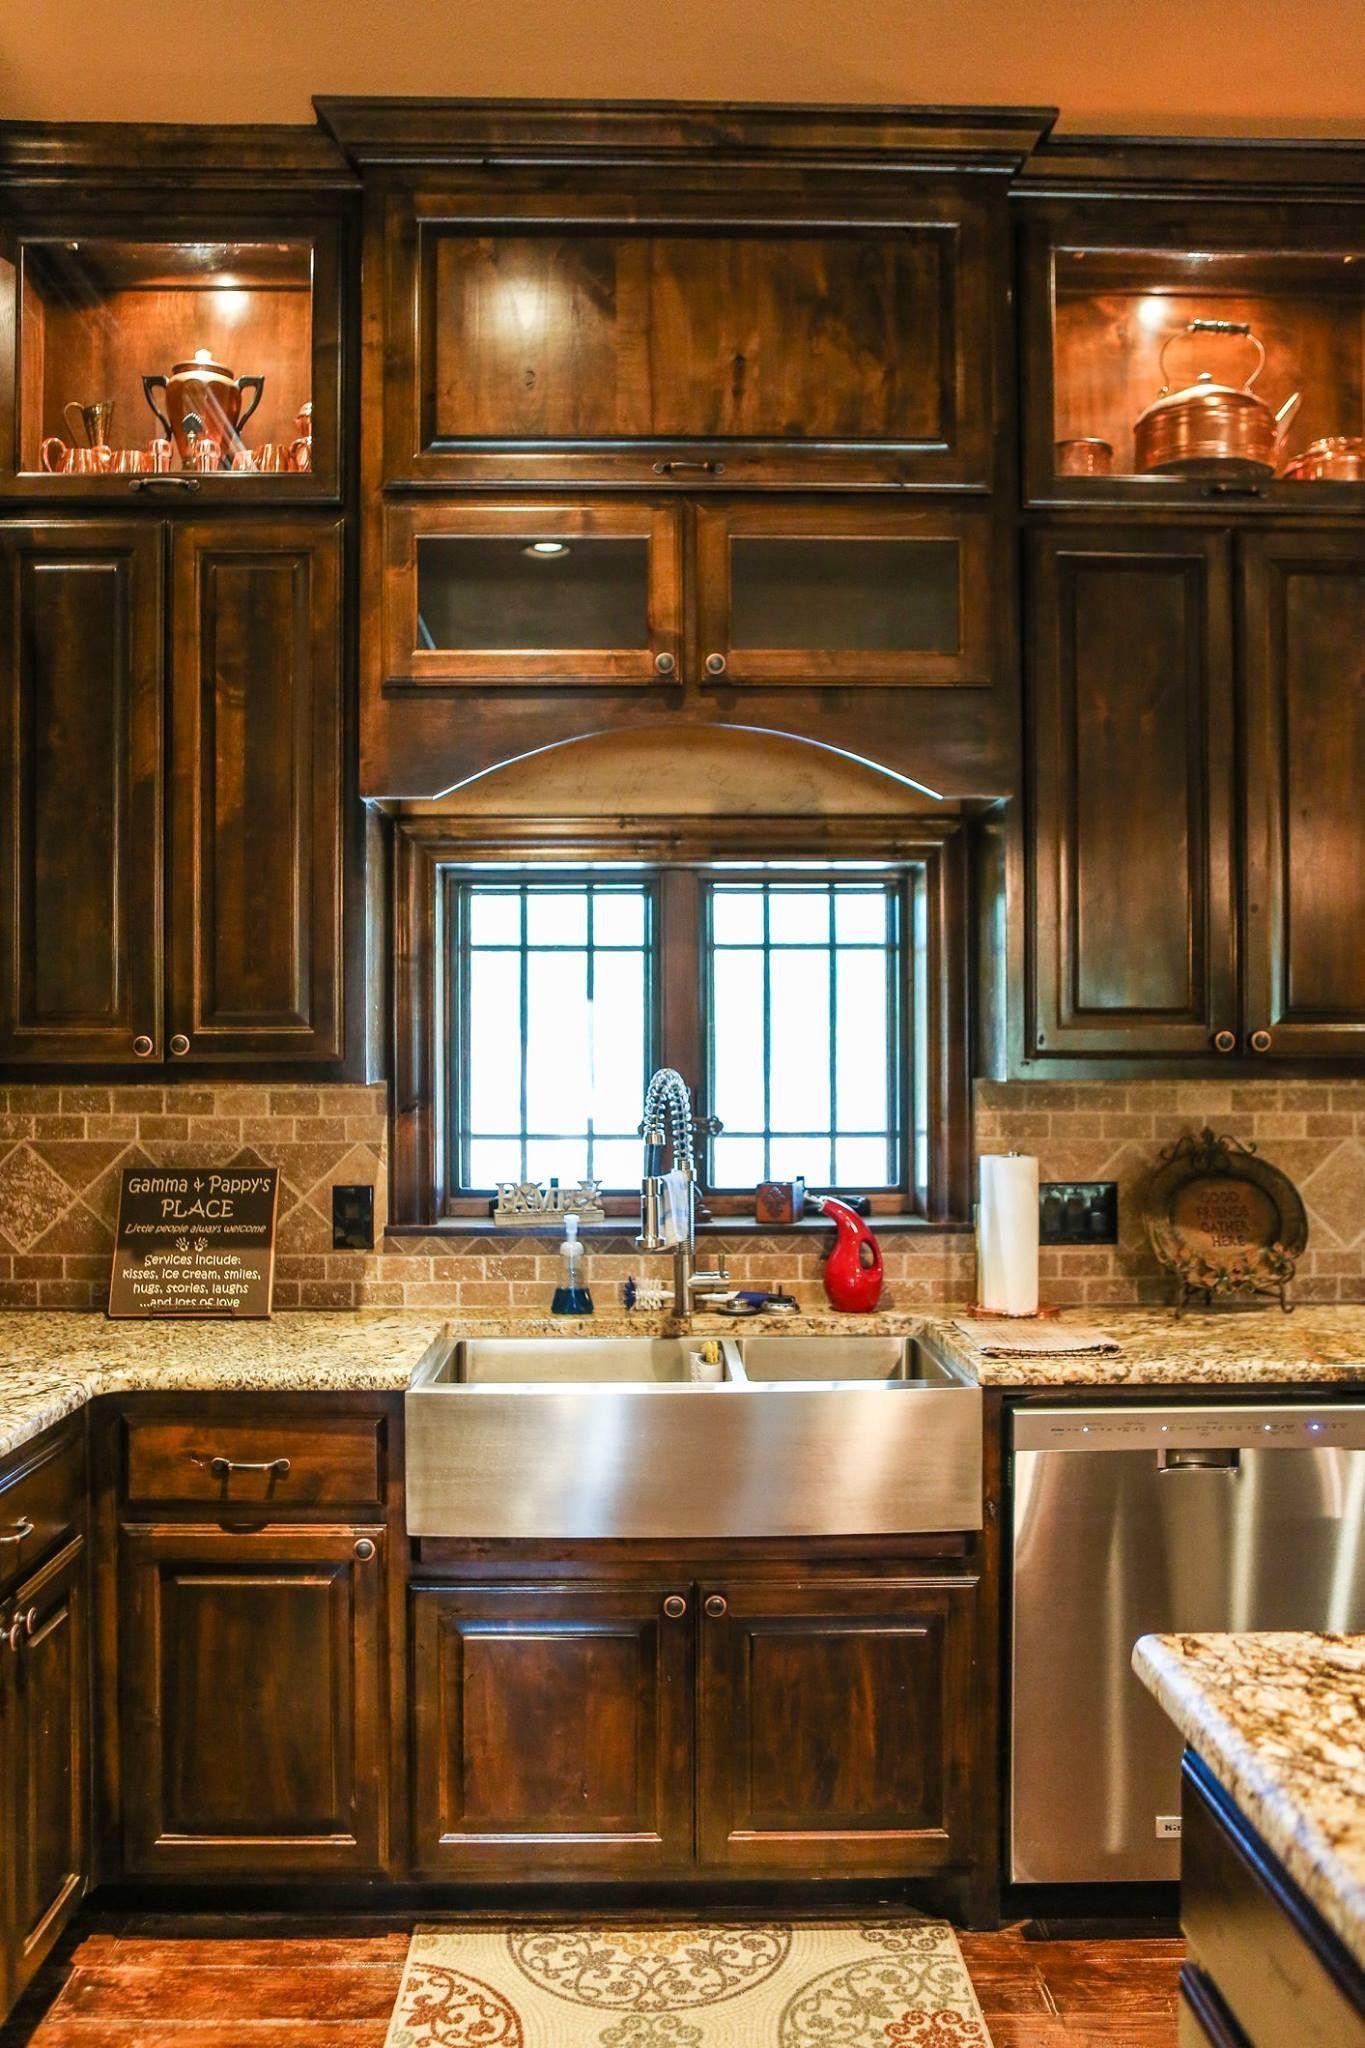 rustic kitchen cabinet designs 2021 in 2020 rustic kitchen cabinets rustic kitchen tuscan on kitchen id=98629